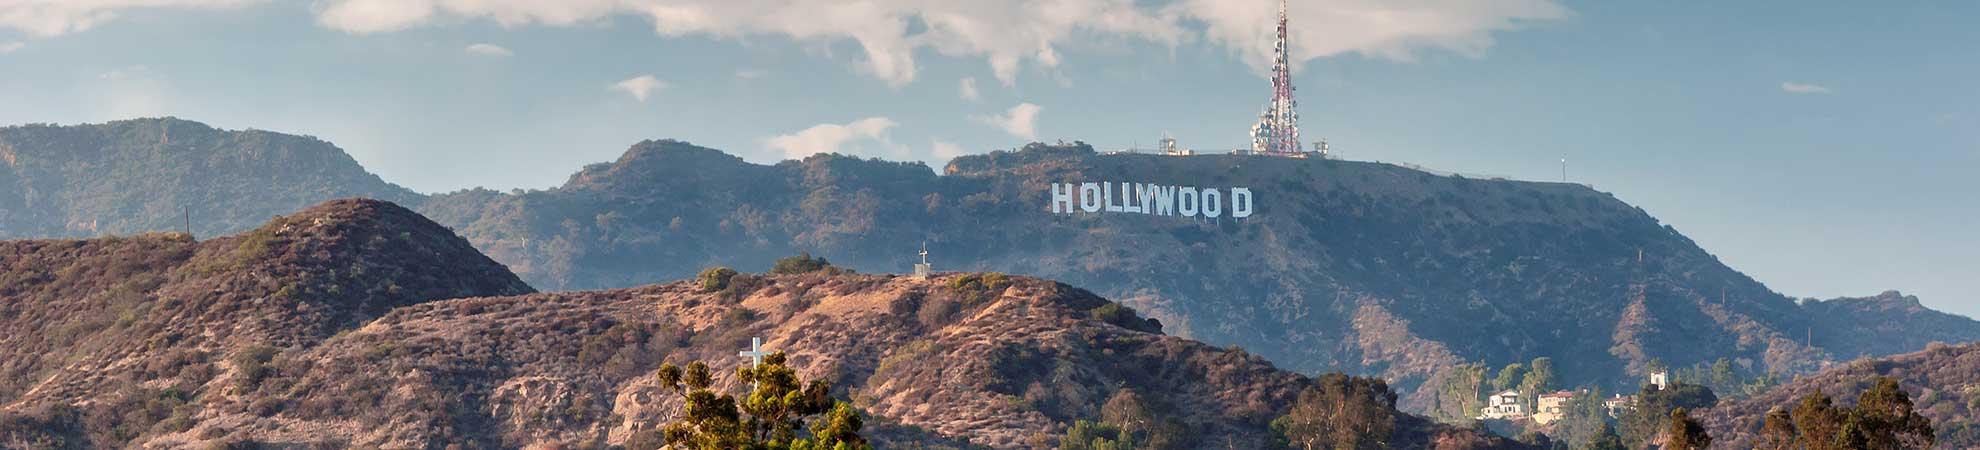 Voyage Hollywood